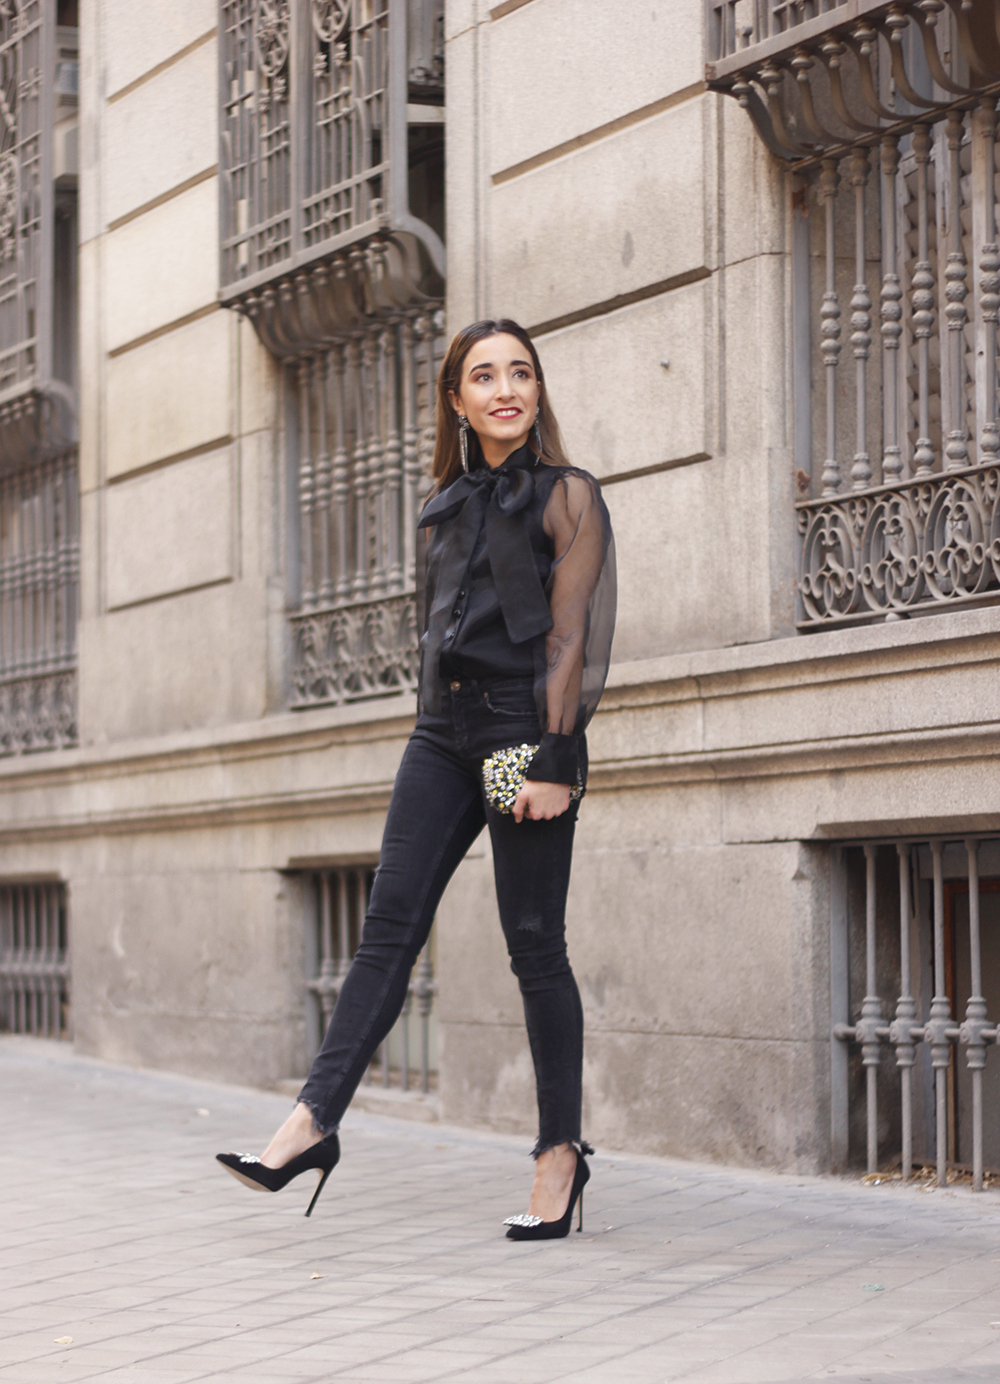 black shirt jeans christmas look fashion street style xmas 20188645